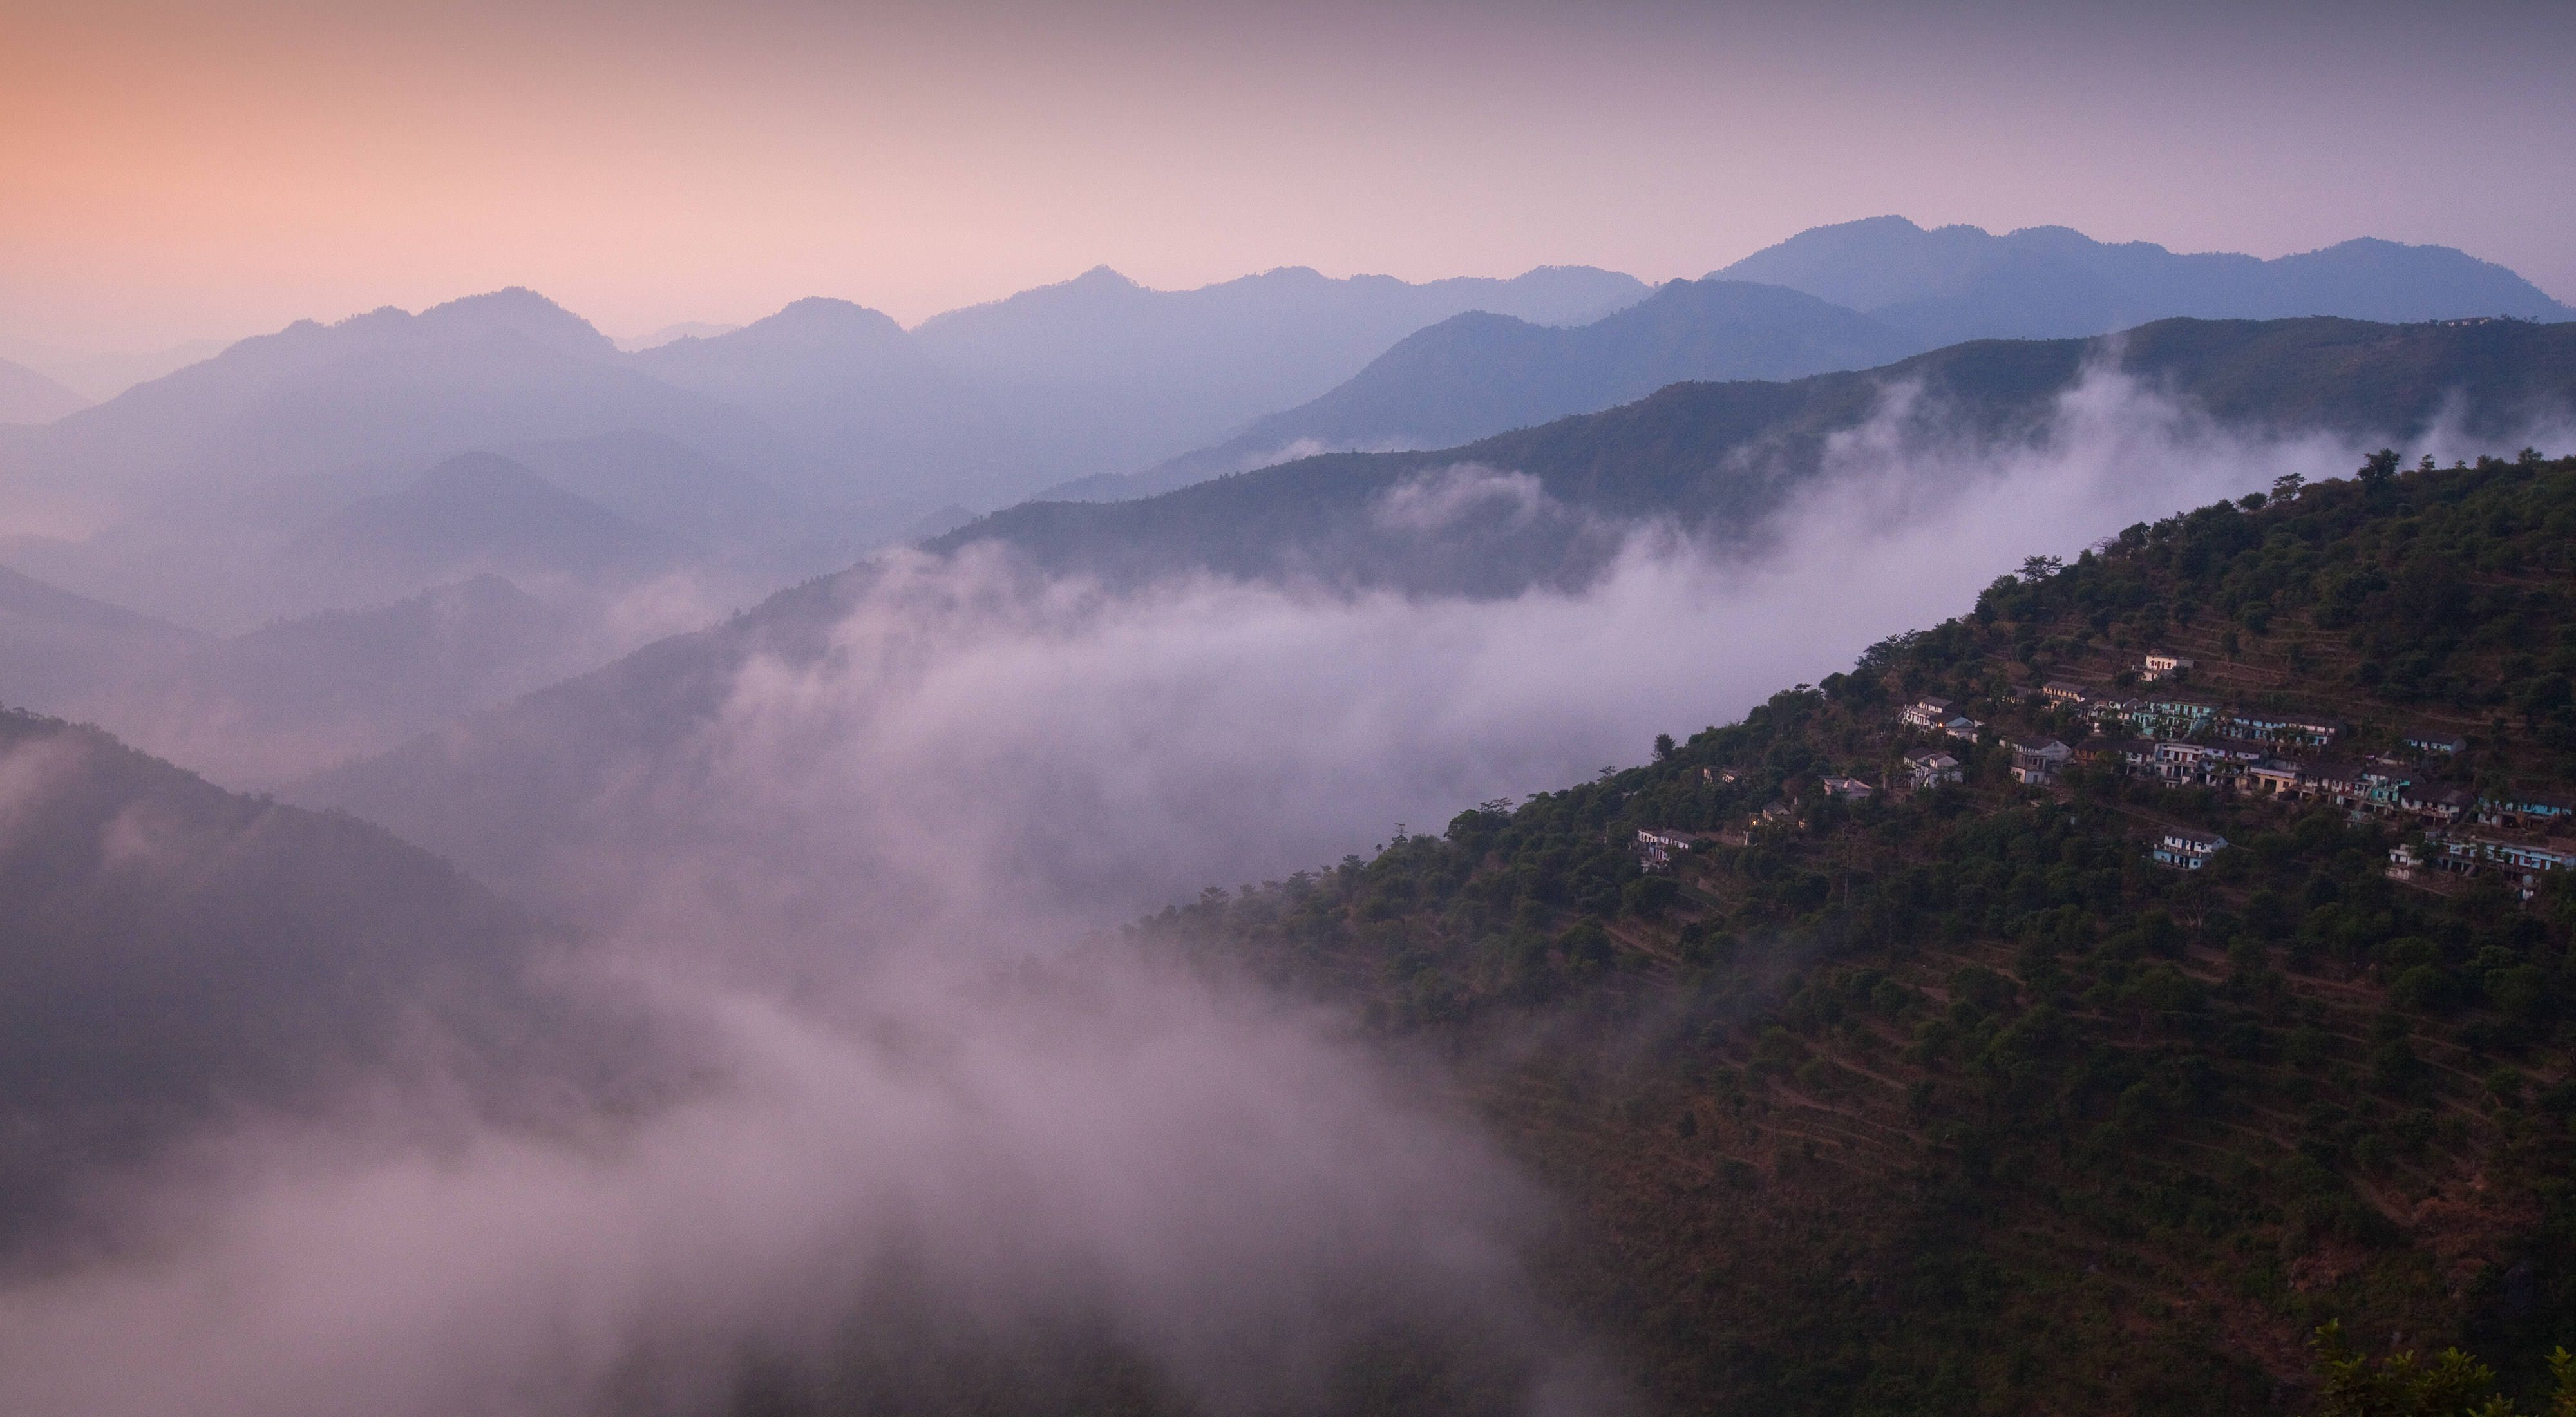 Lower Himalaya, India